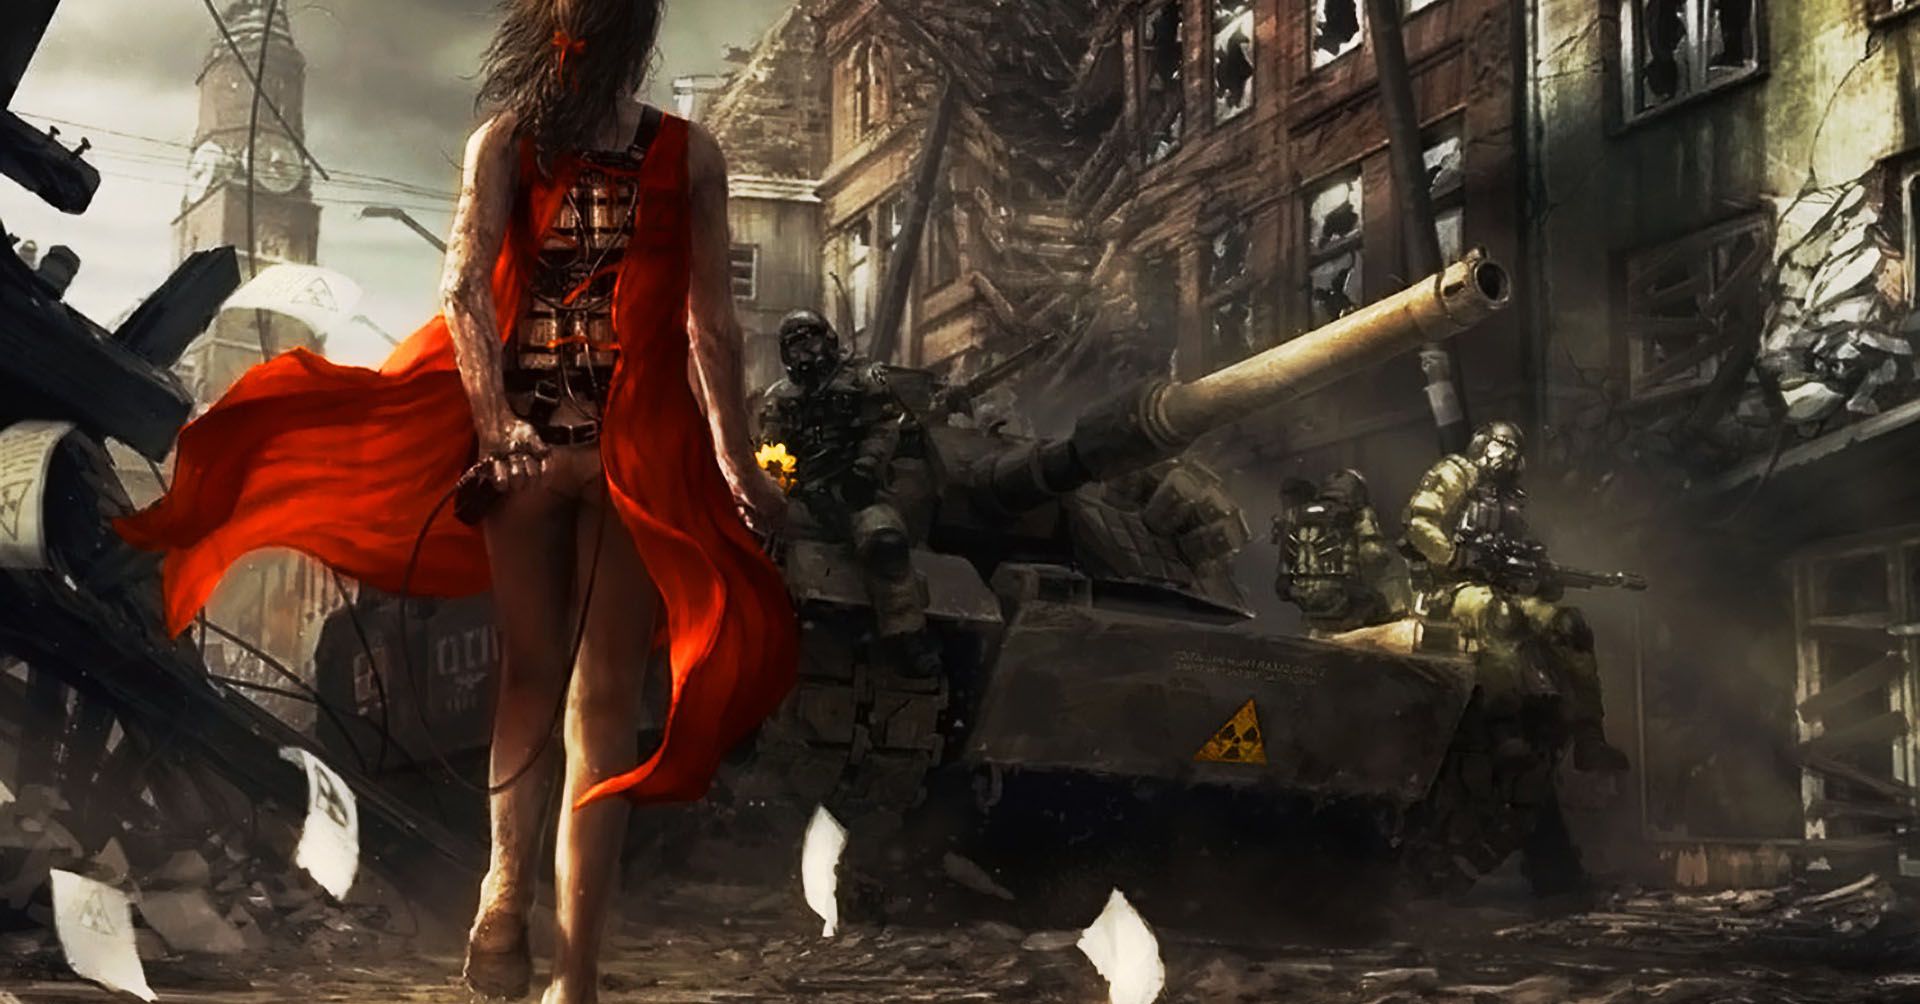 Metro 2033 Wallpaper Hd Military Suicide Apocalypse War Dress Wallpapers Hd